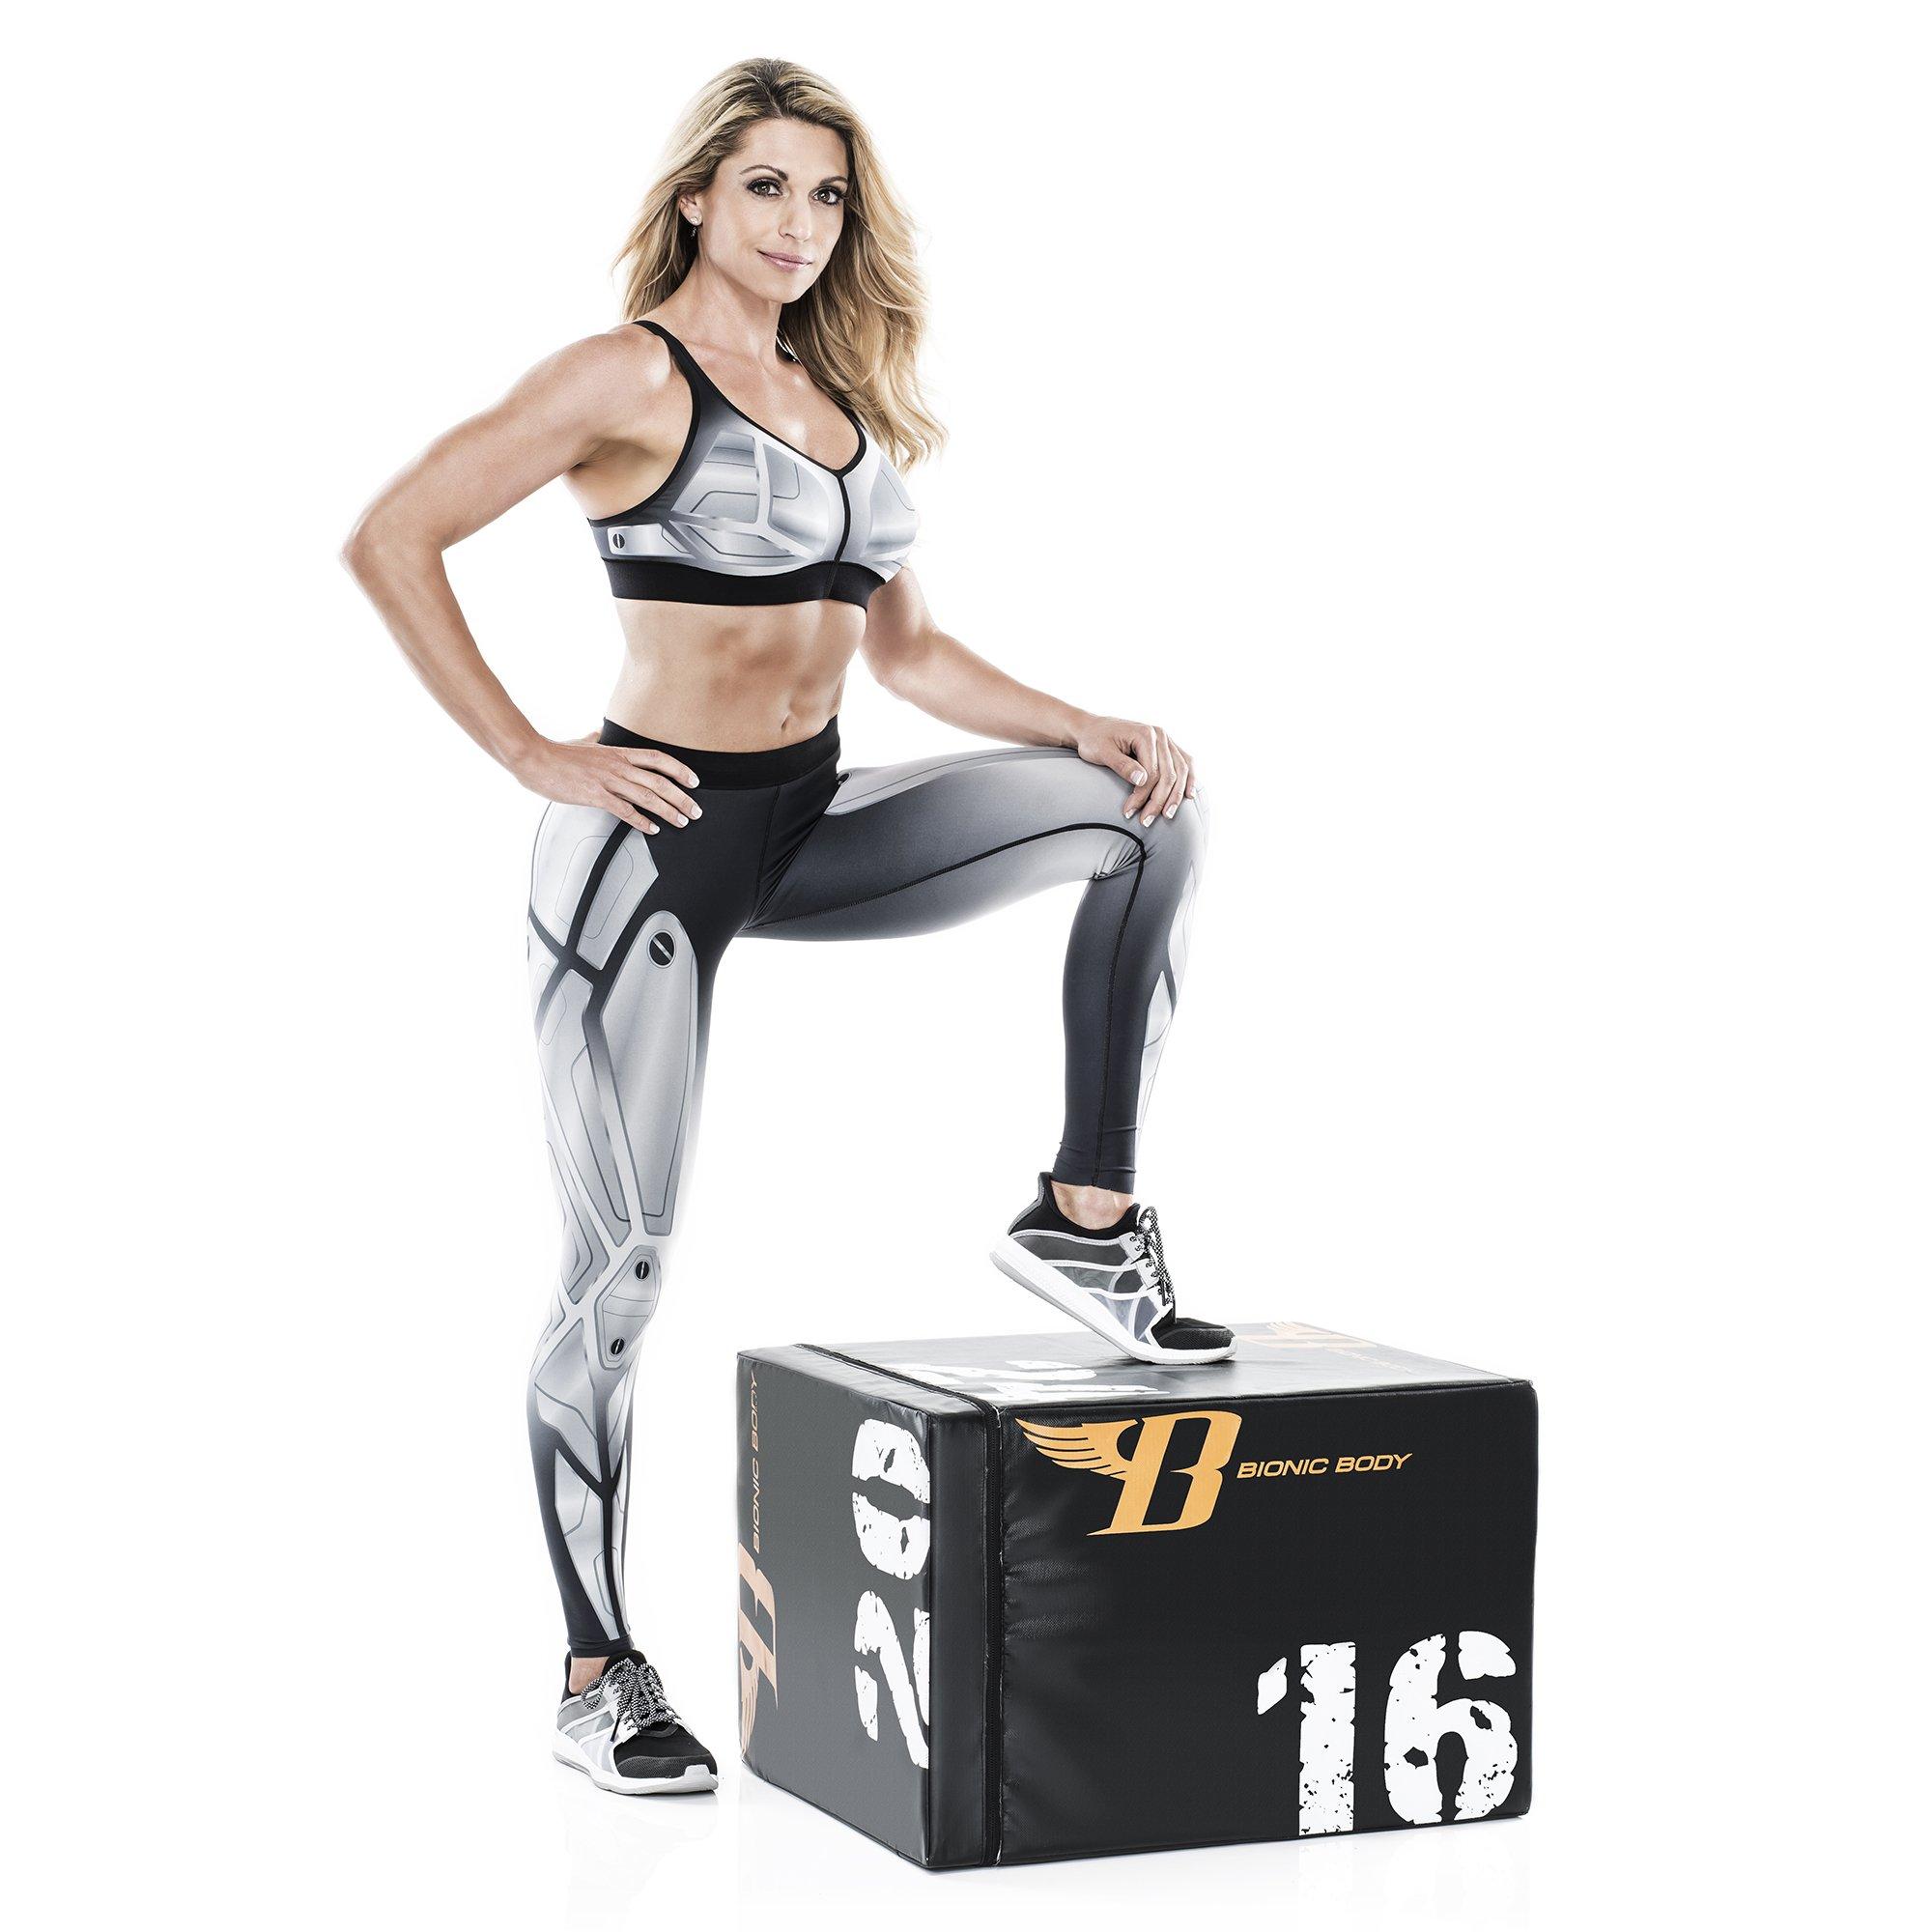 Bionic Body Plyo Exercise Box Plyometric Box with Soft Cover BBPB-1106 by Bionic Body (Image #5)